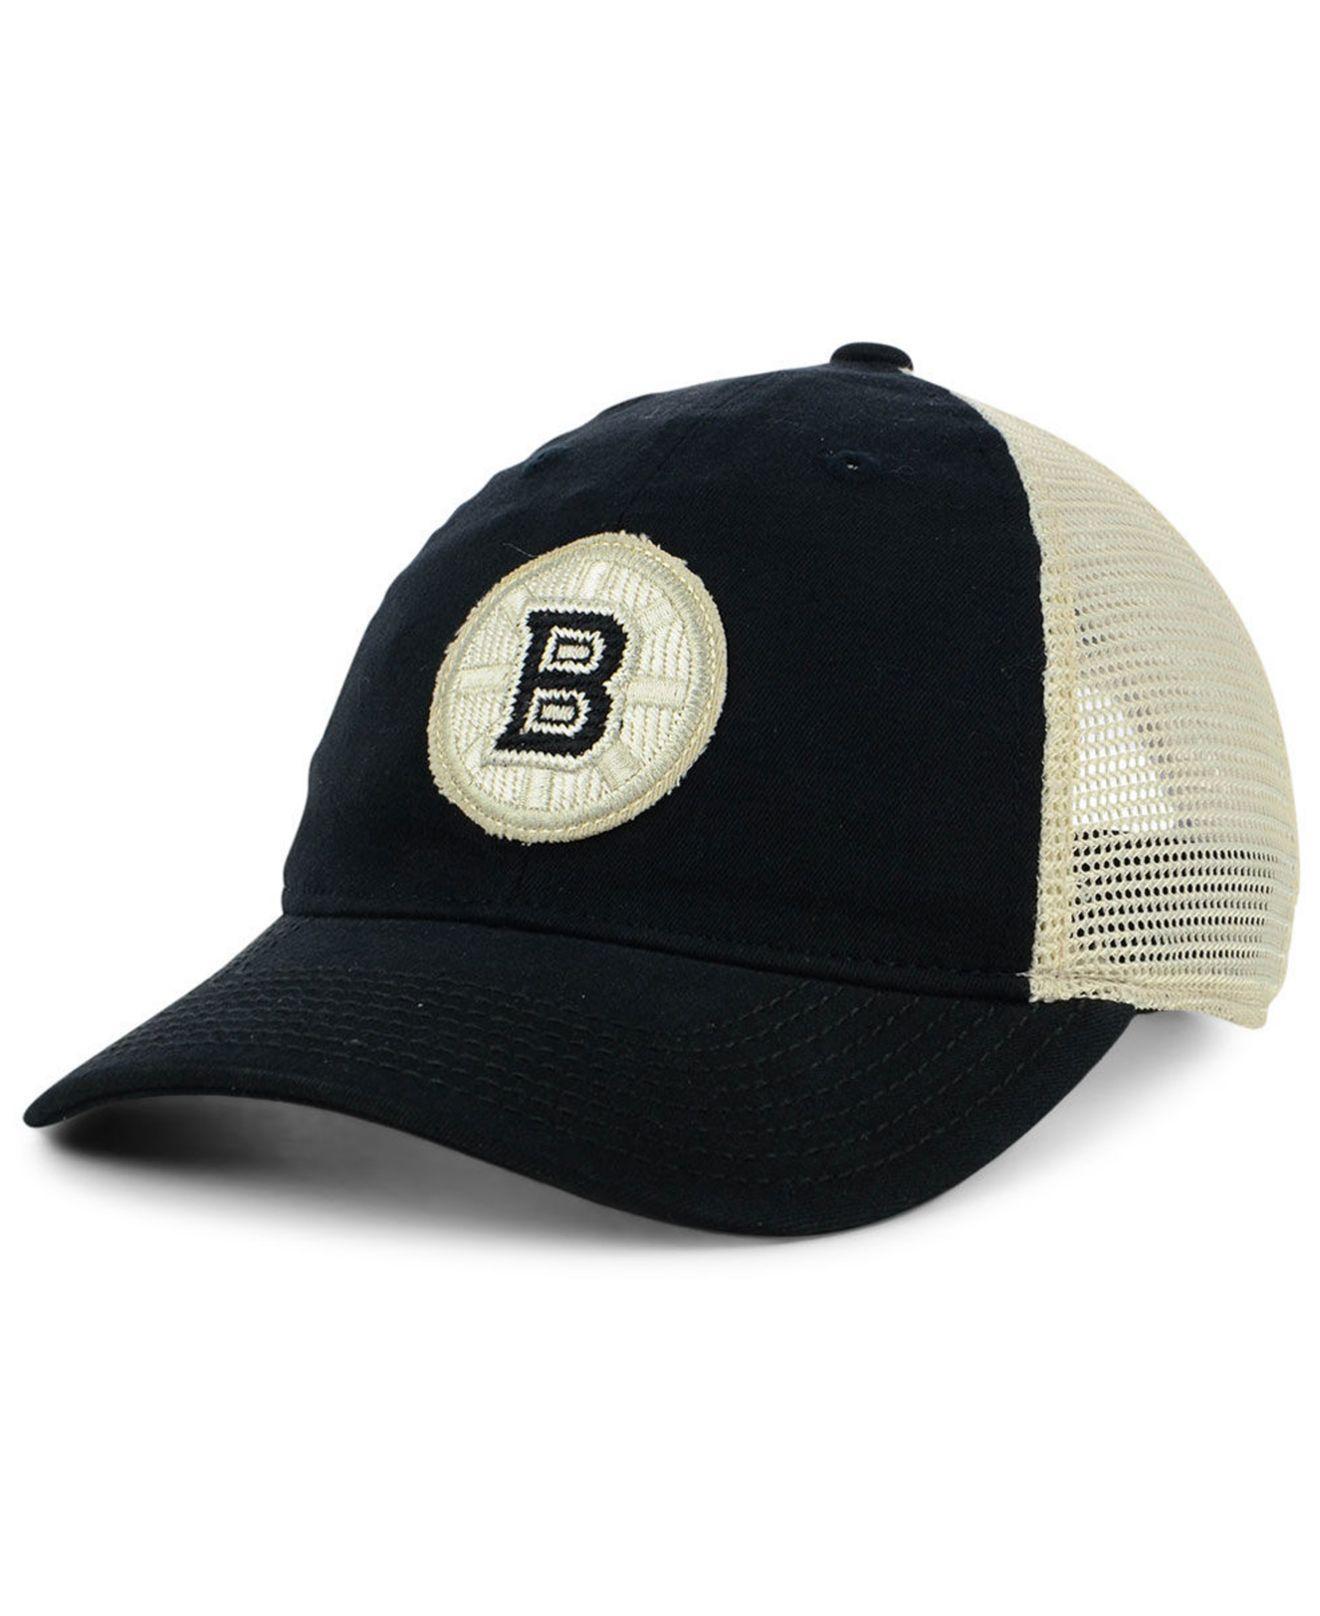 a31e463b141ca Lyst - adidas Boston Bruins Sun Bleached Slouch Snapback Cap in ...